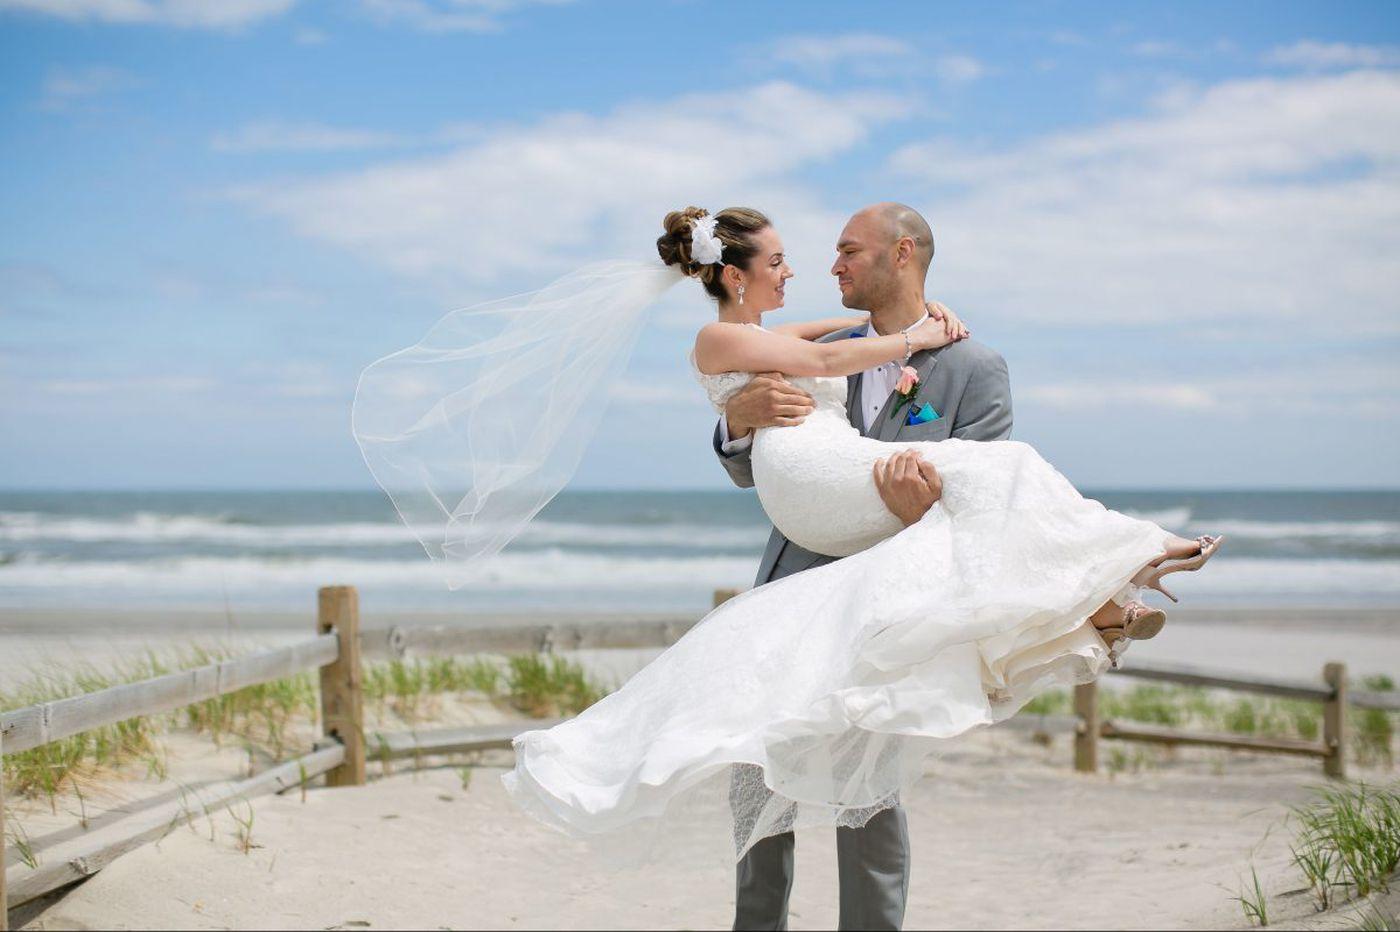 Weddings: Christy Mauro and Eric Lee